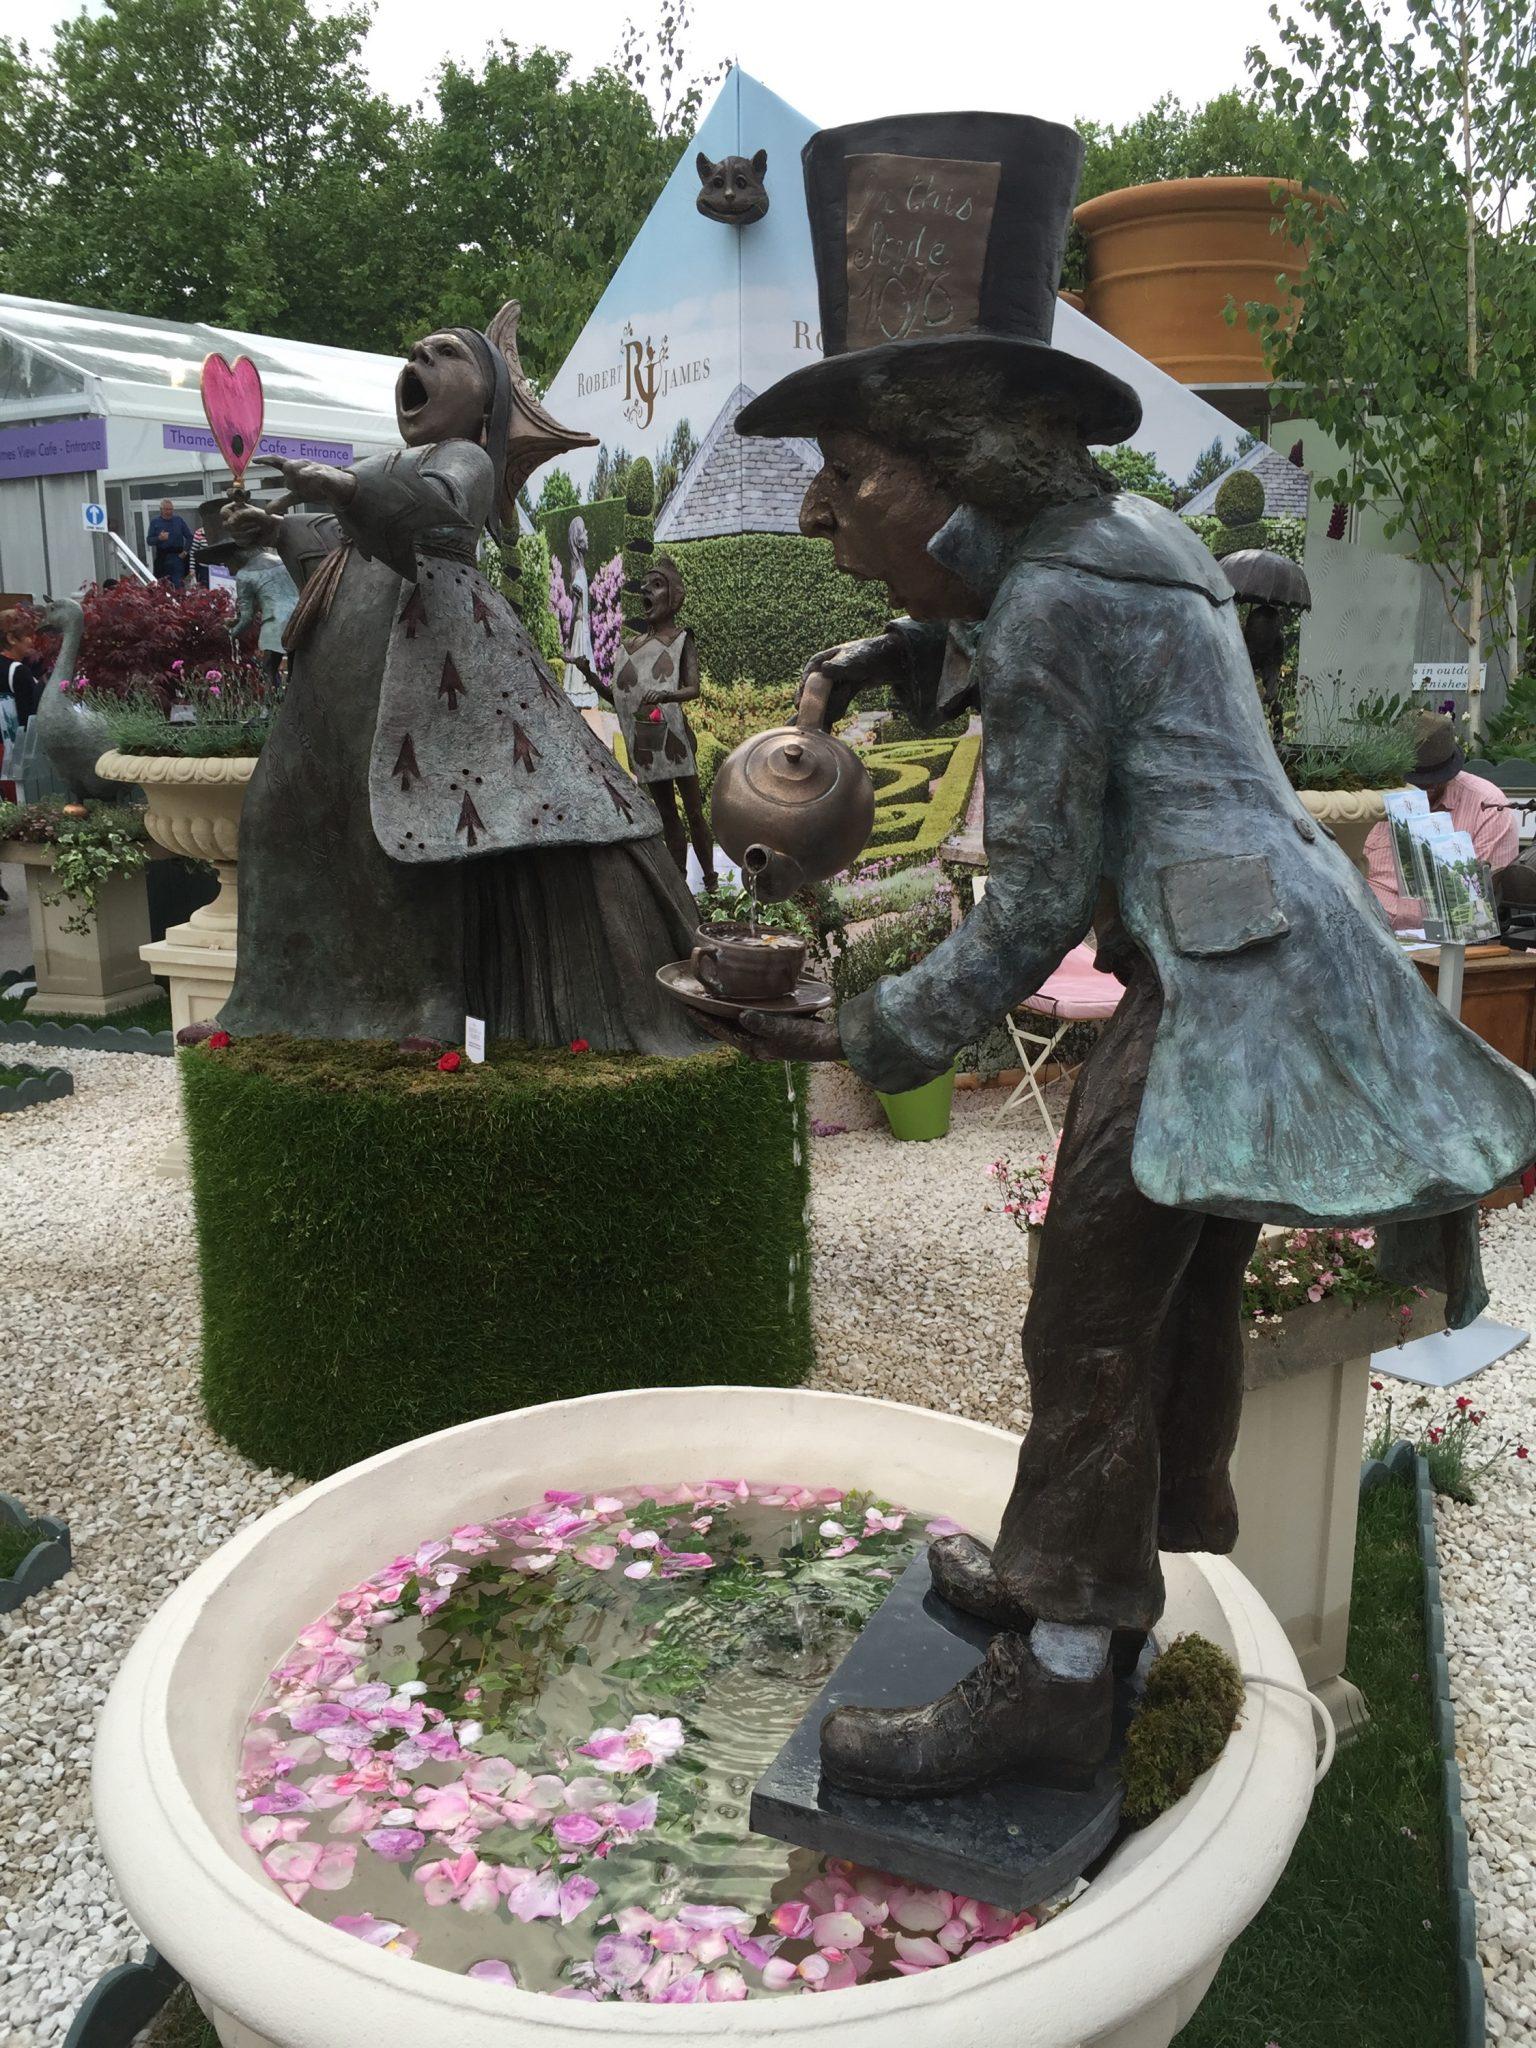 Robert James Alice in Wonderland Mad Hatter sculpture Chelsea Flower show